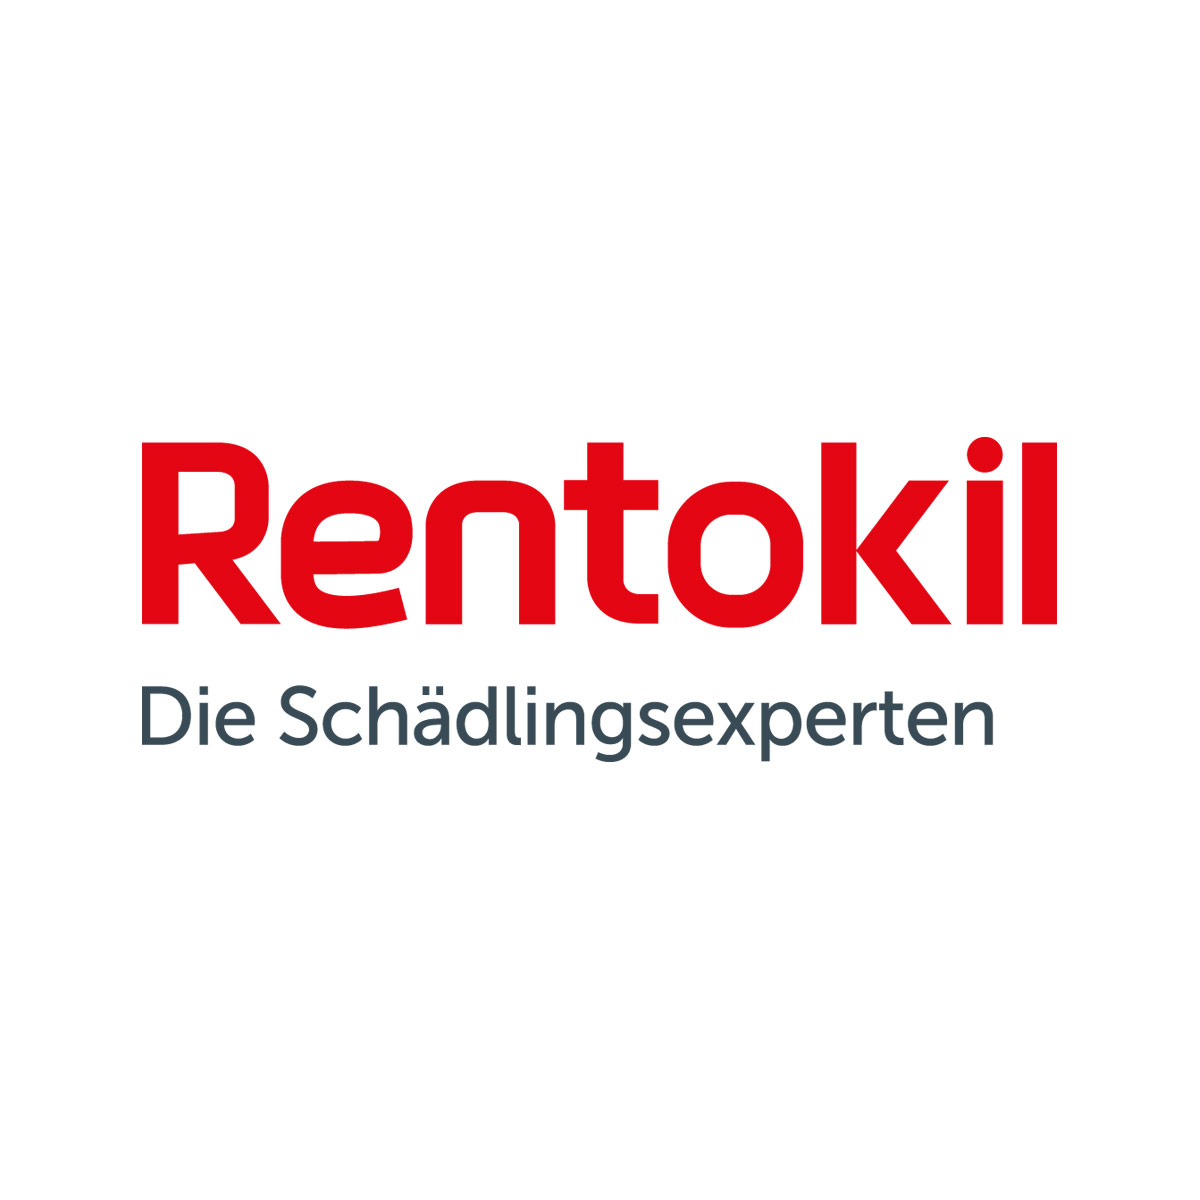 Rentokil Schädlingsbekämpfung Frankfurt